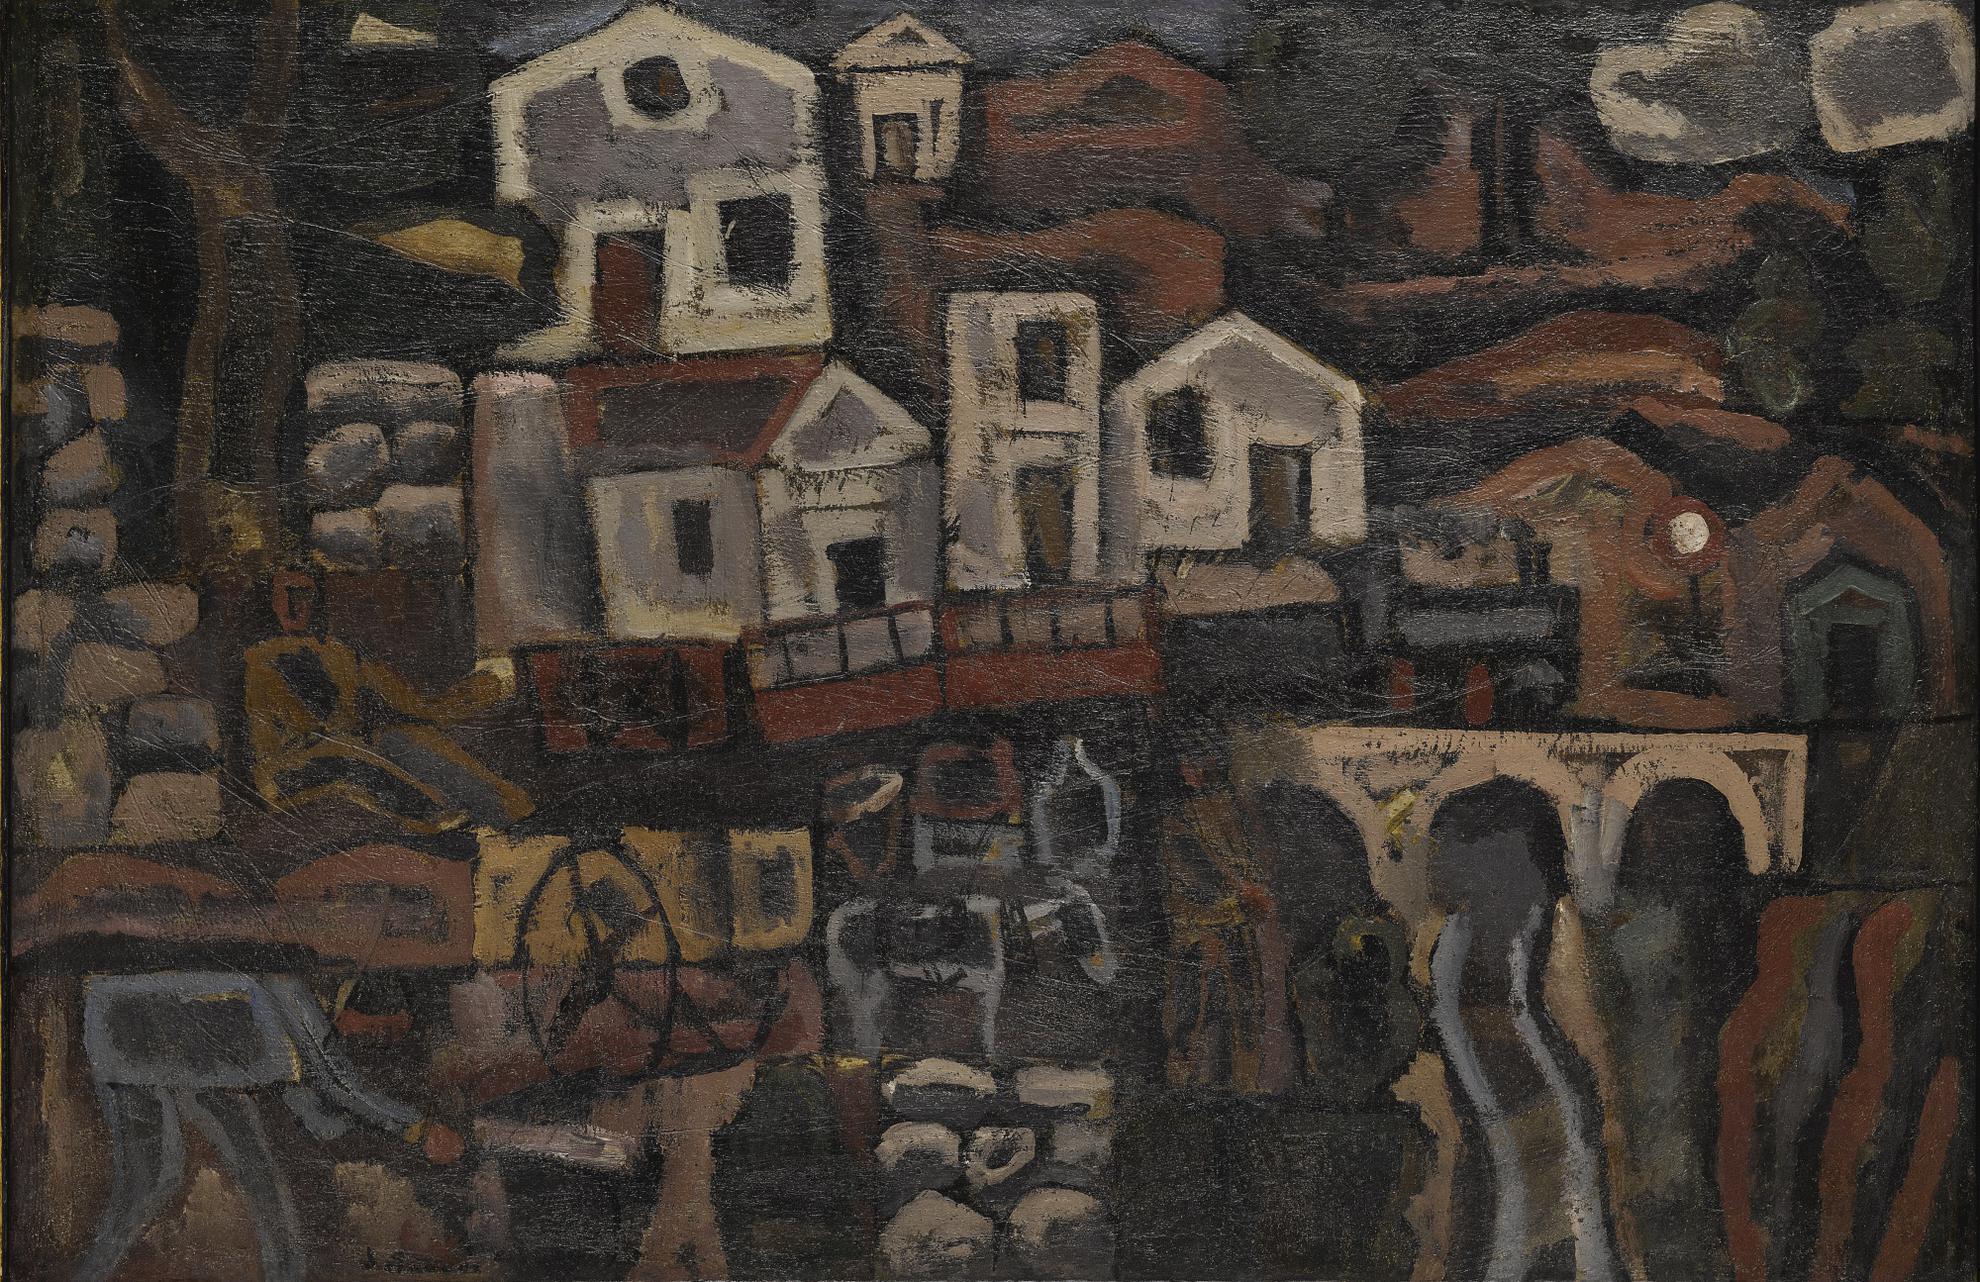 Joaquin Torres-Garcia-The Village-1925